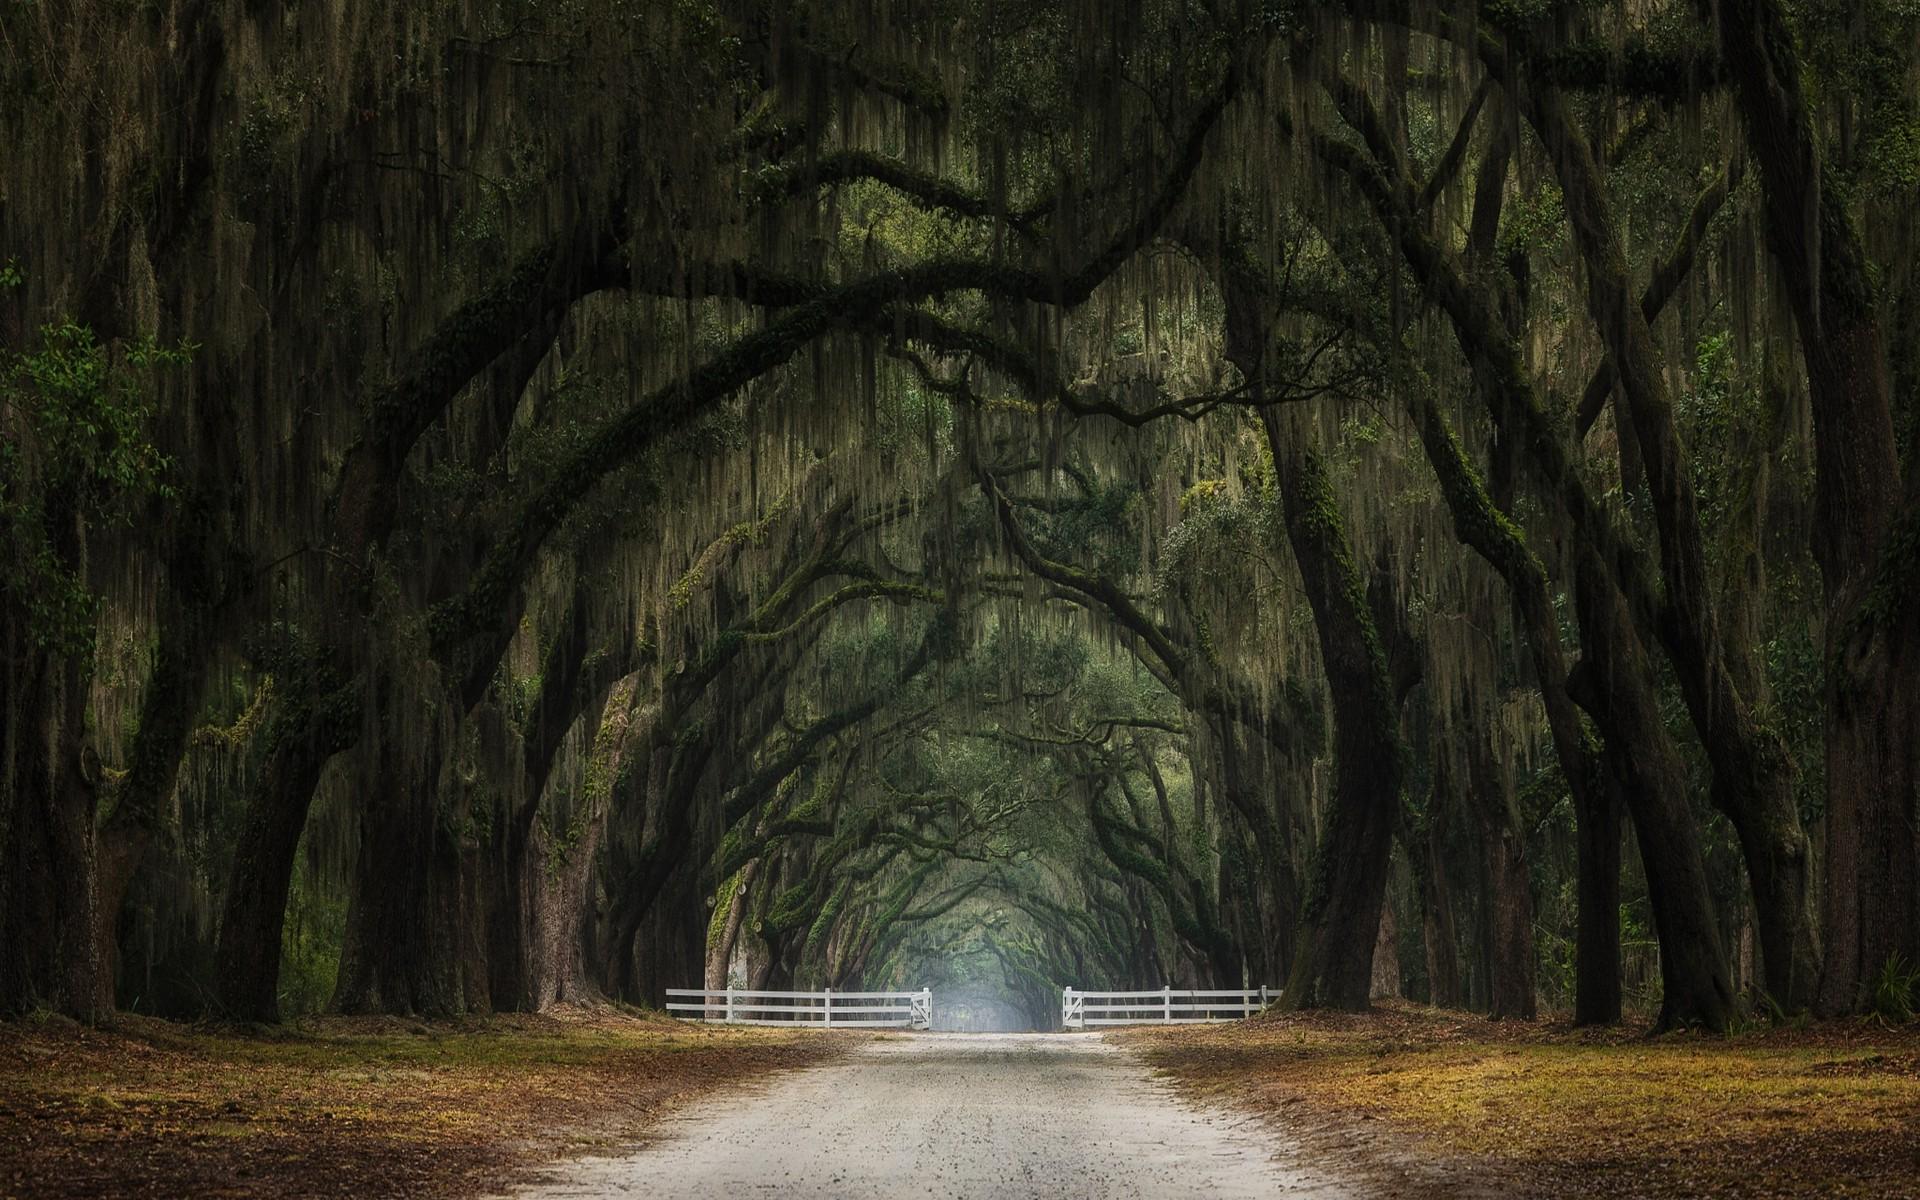 Jungle Animal Wallpaper Nature Landscape Oak Trees Gates Tunnel Leaves Dirt